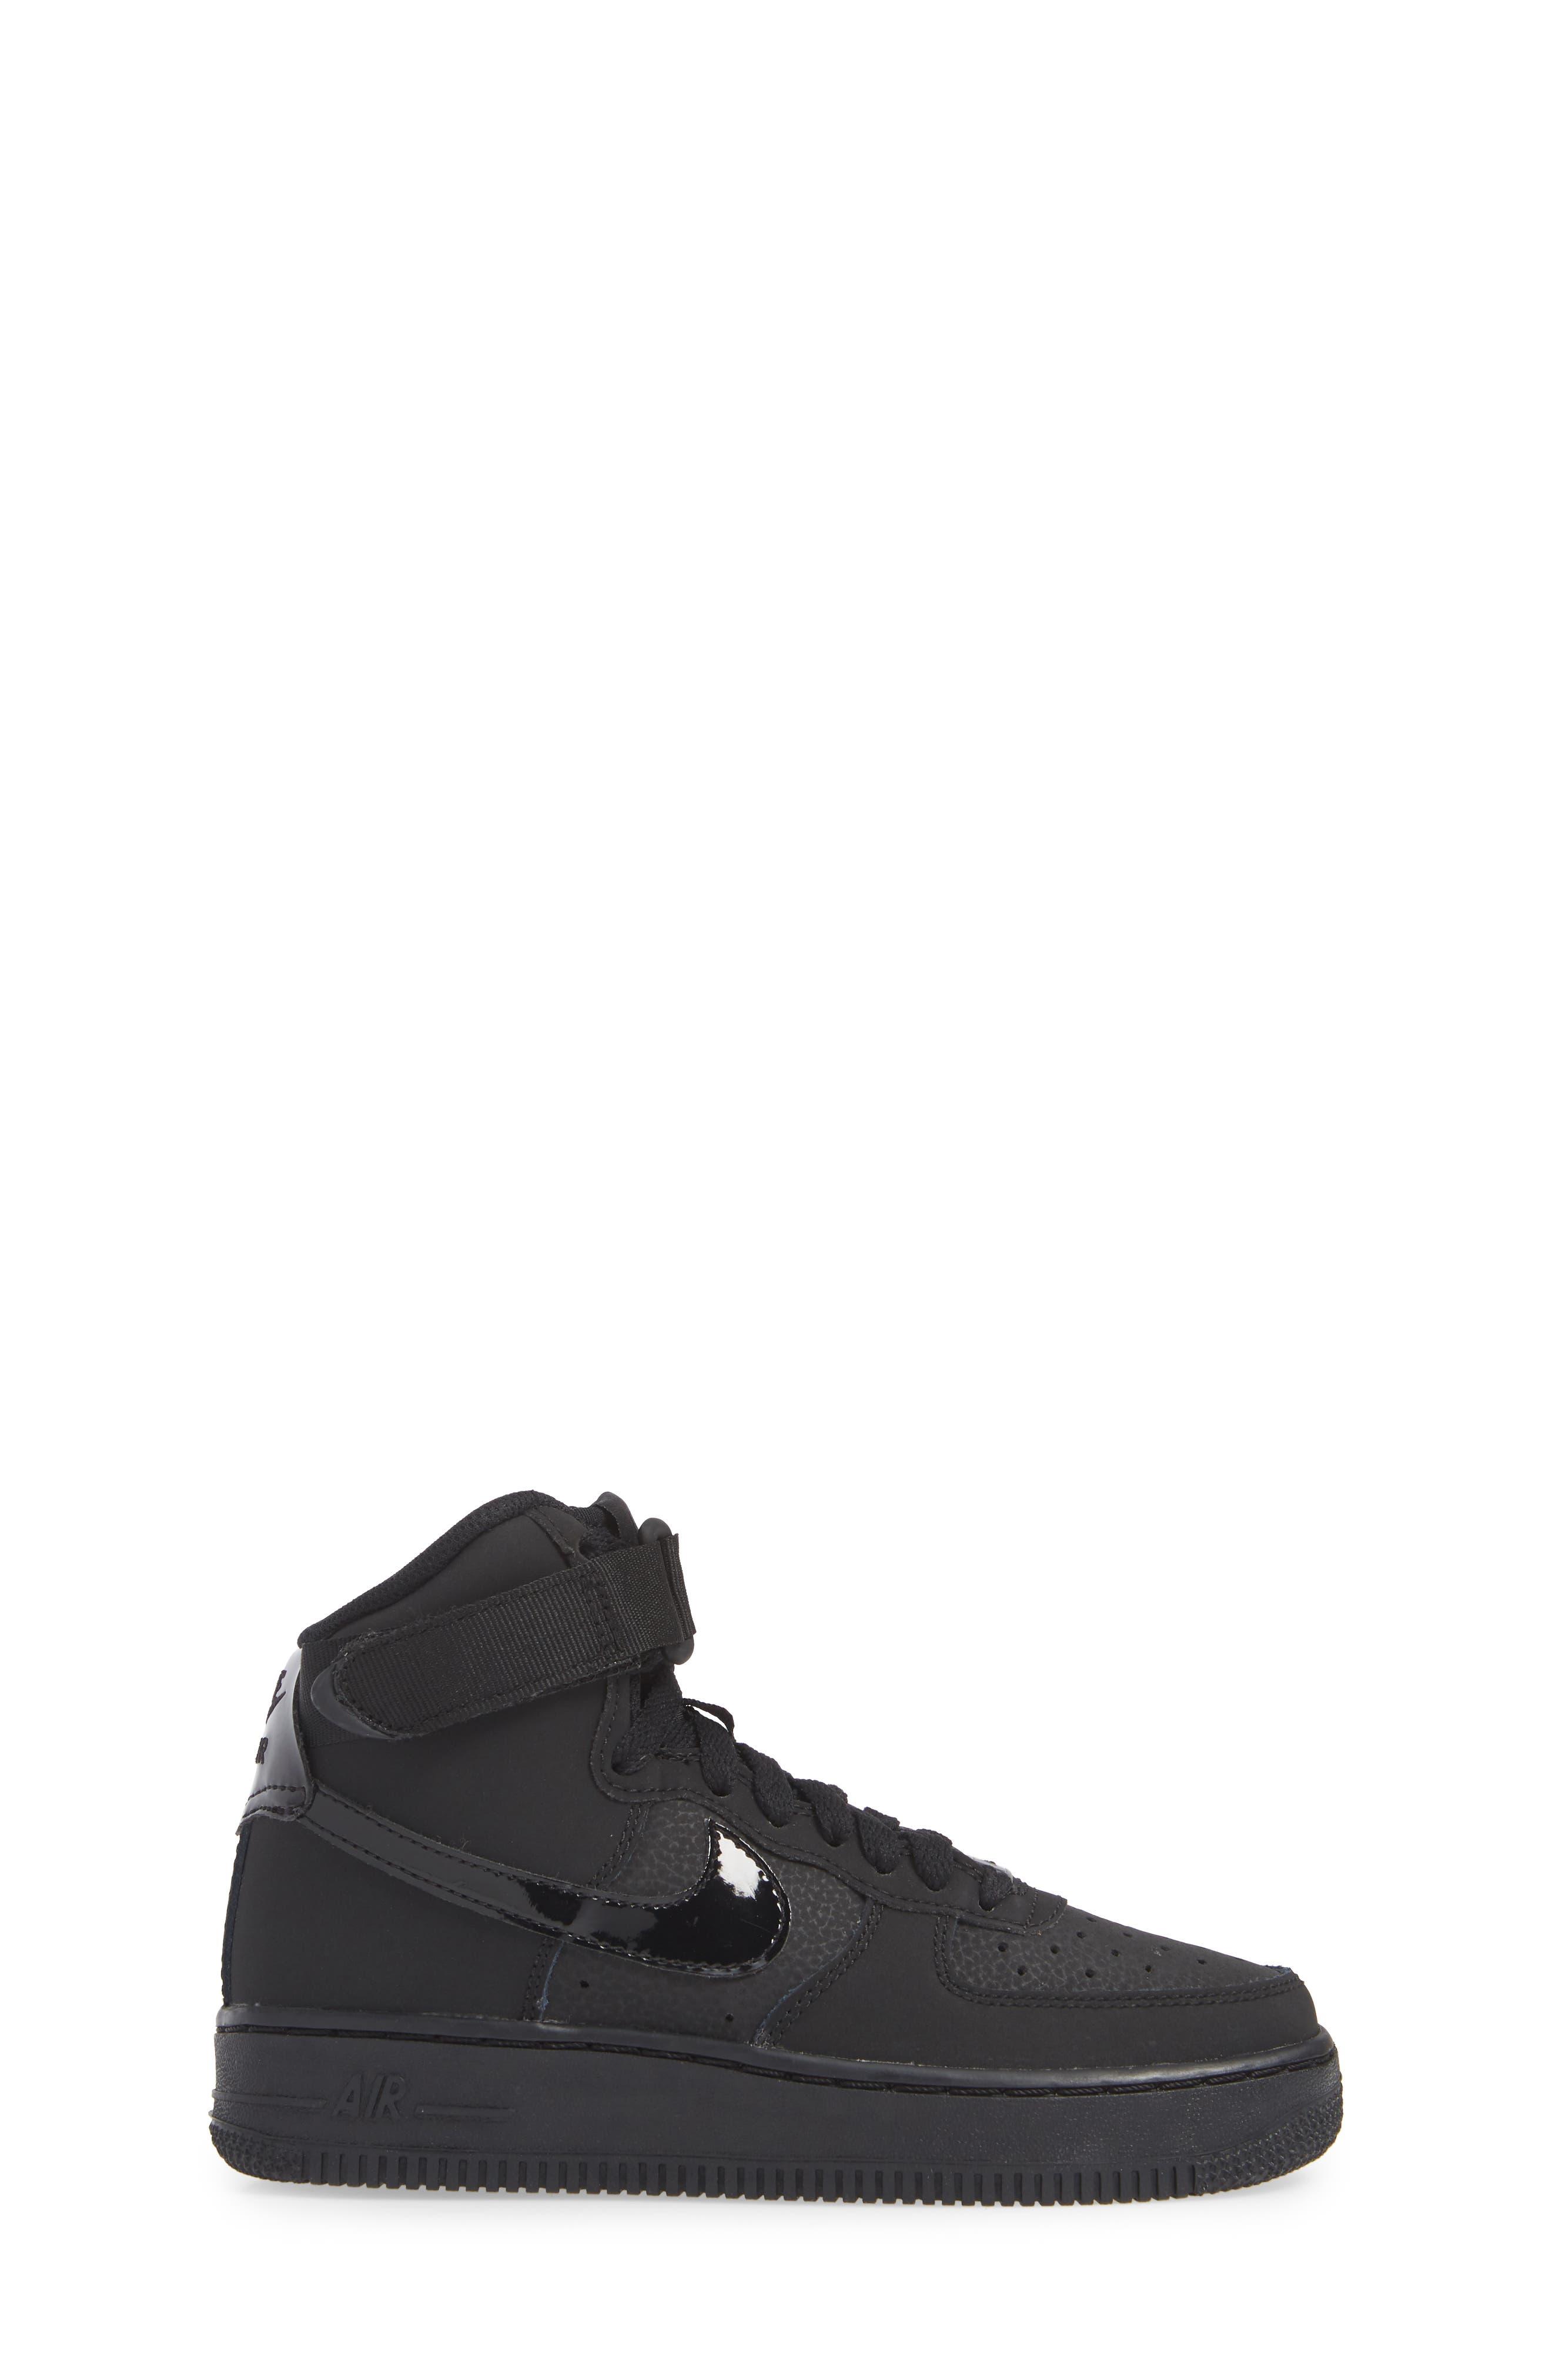 NIKE, Air Force 1 High Top Sneaker, Alternate thumbnail 3, color, 001